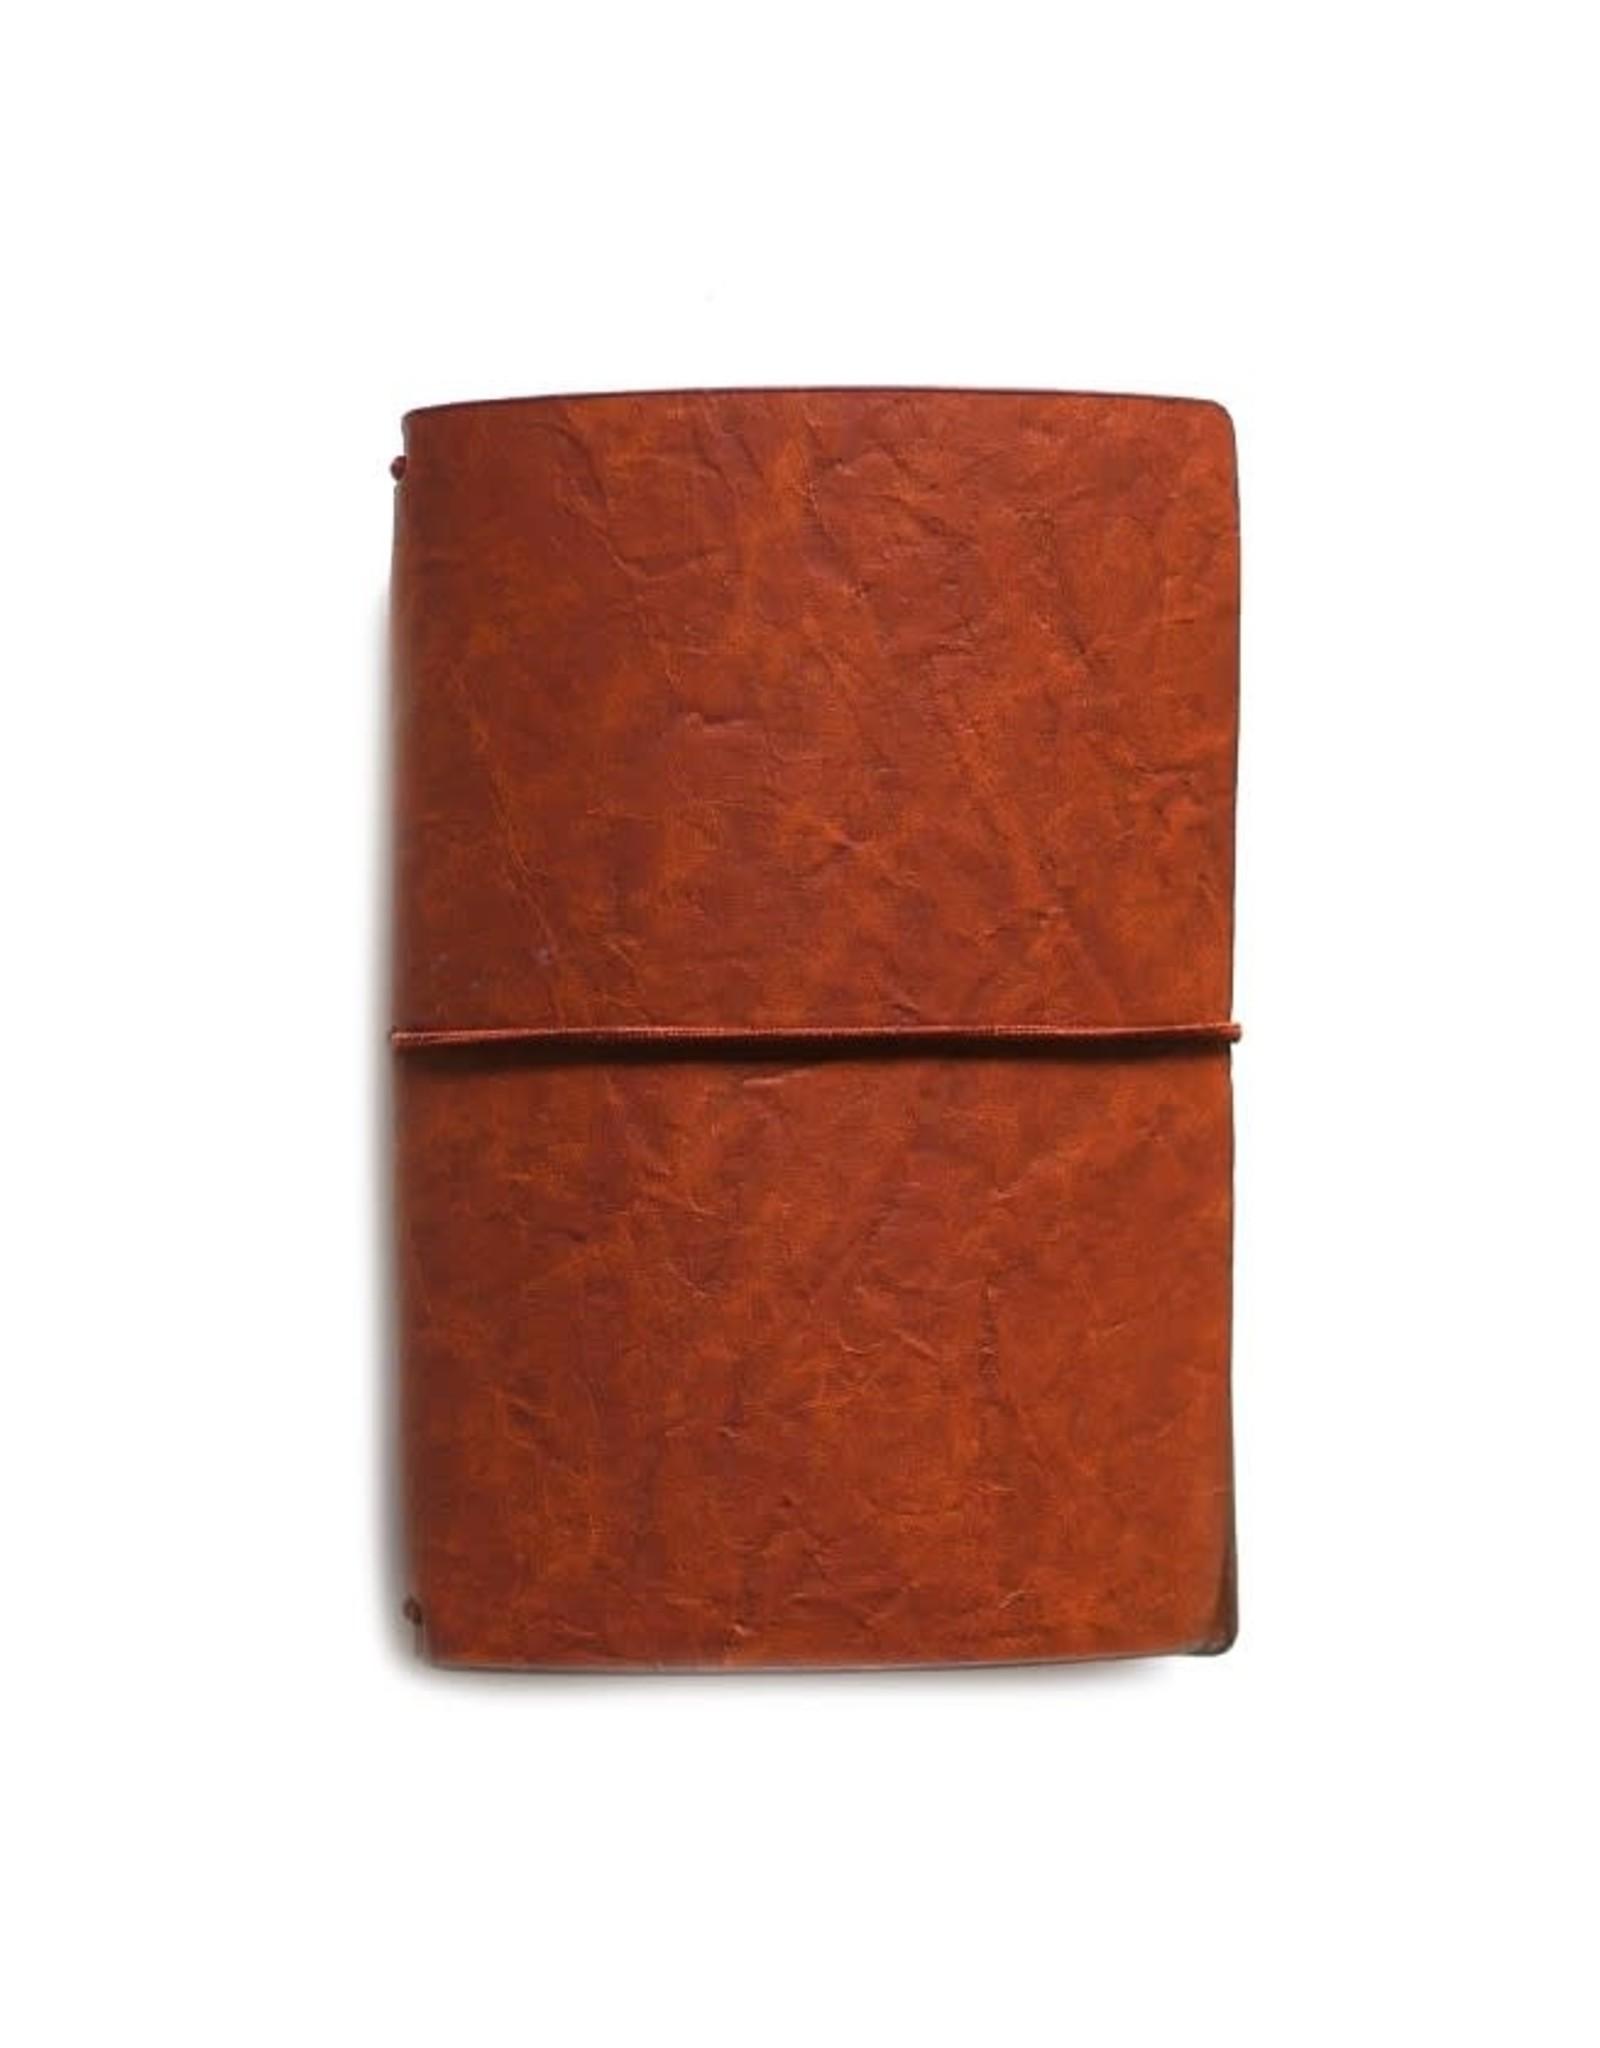 Elizabeth Craft Designs Elizabeth Craft Designs Art Journal Vintage Brown Traveler's Notebook TN01